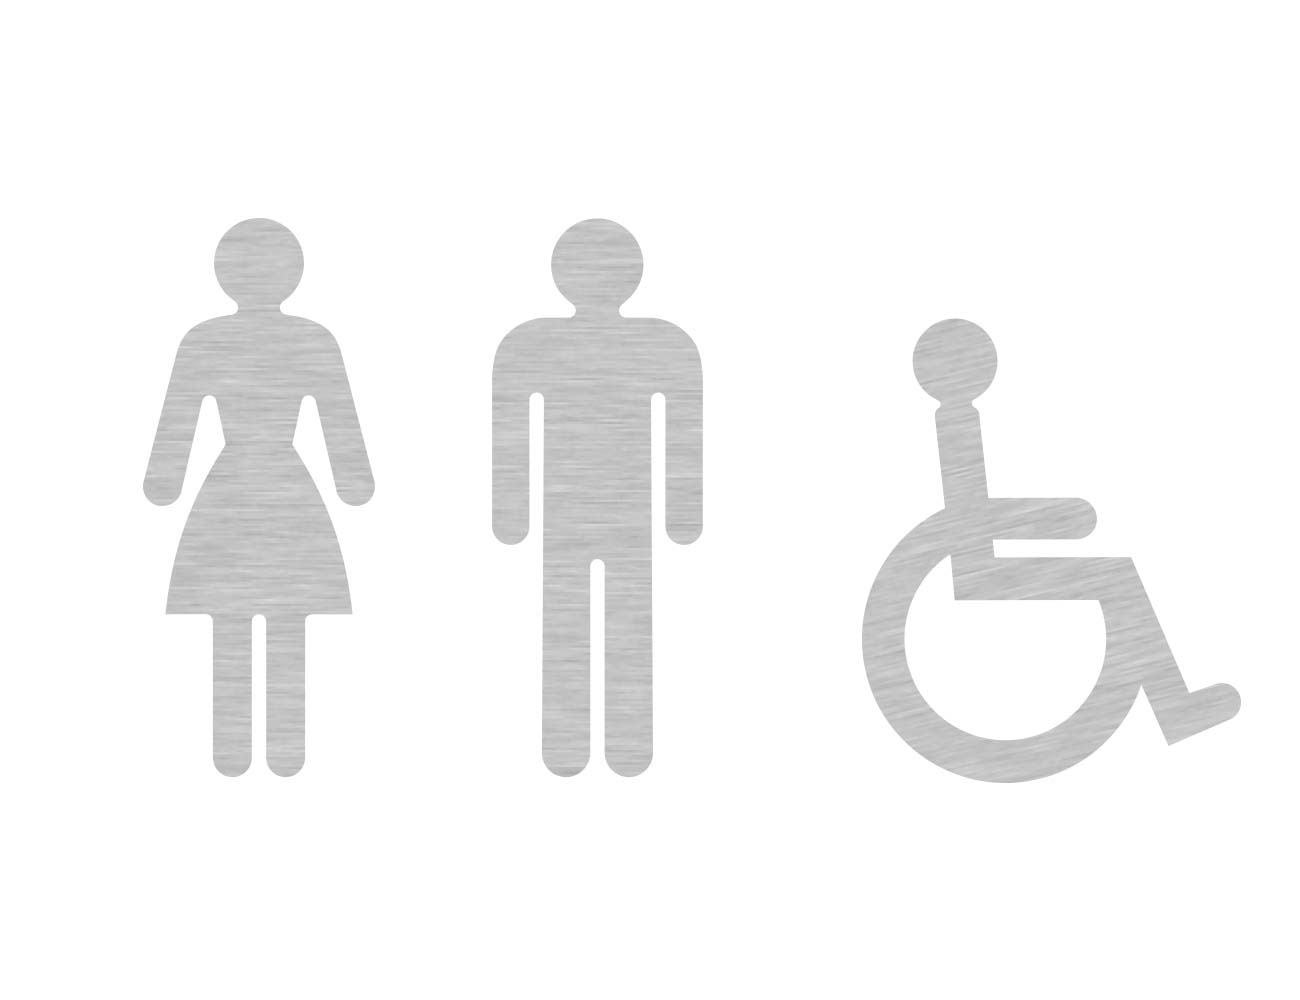 WC Piktogramme - Variante 2 - Dame/Herr/Rollstuhl